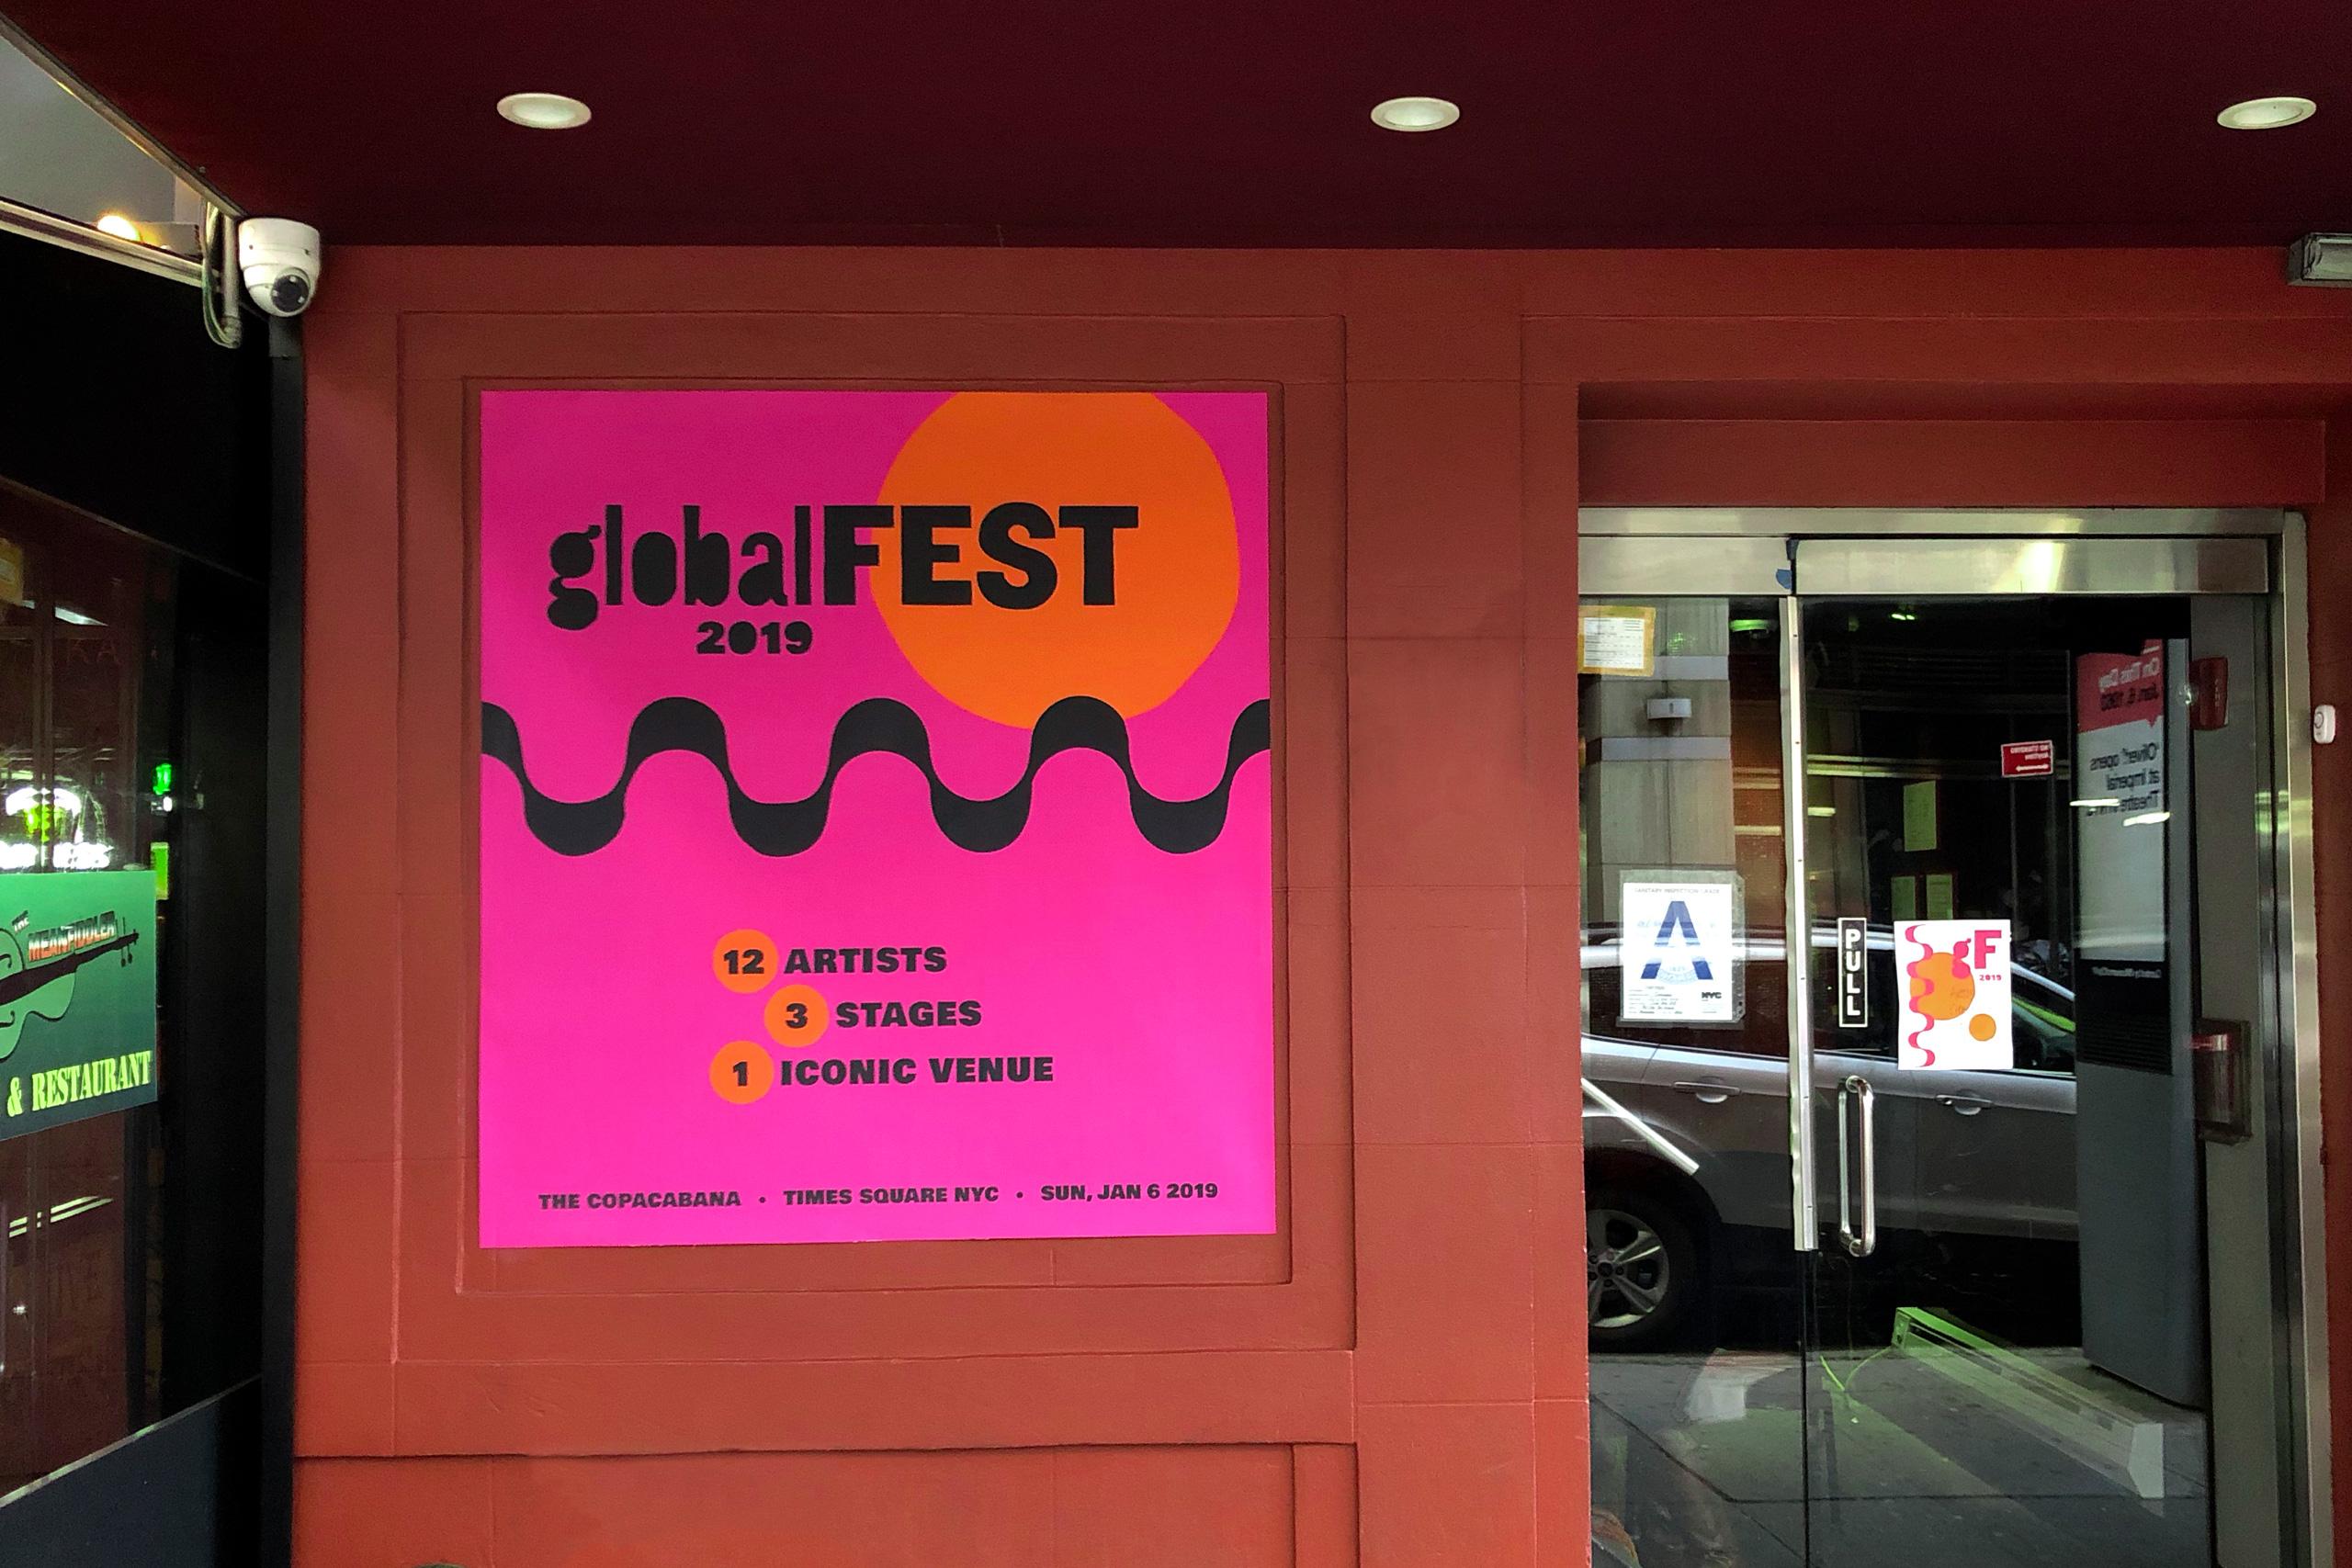 diogomontes_globalfest_2019_12